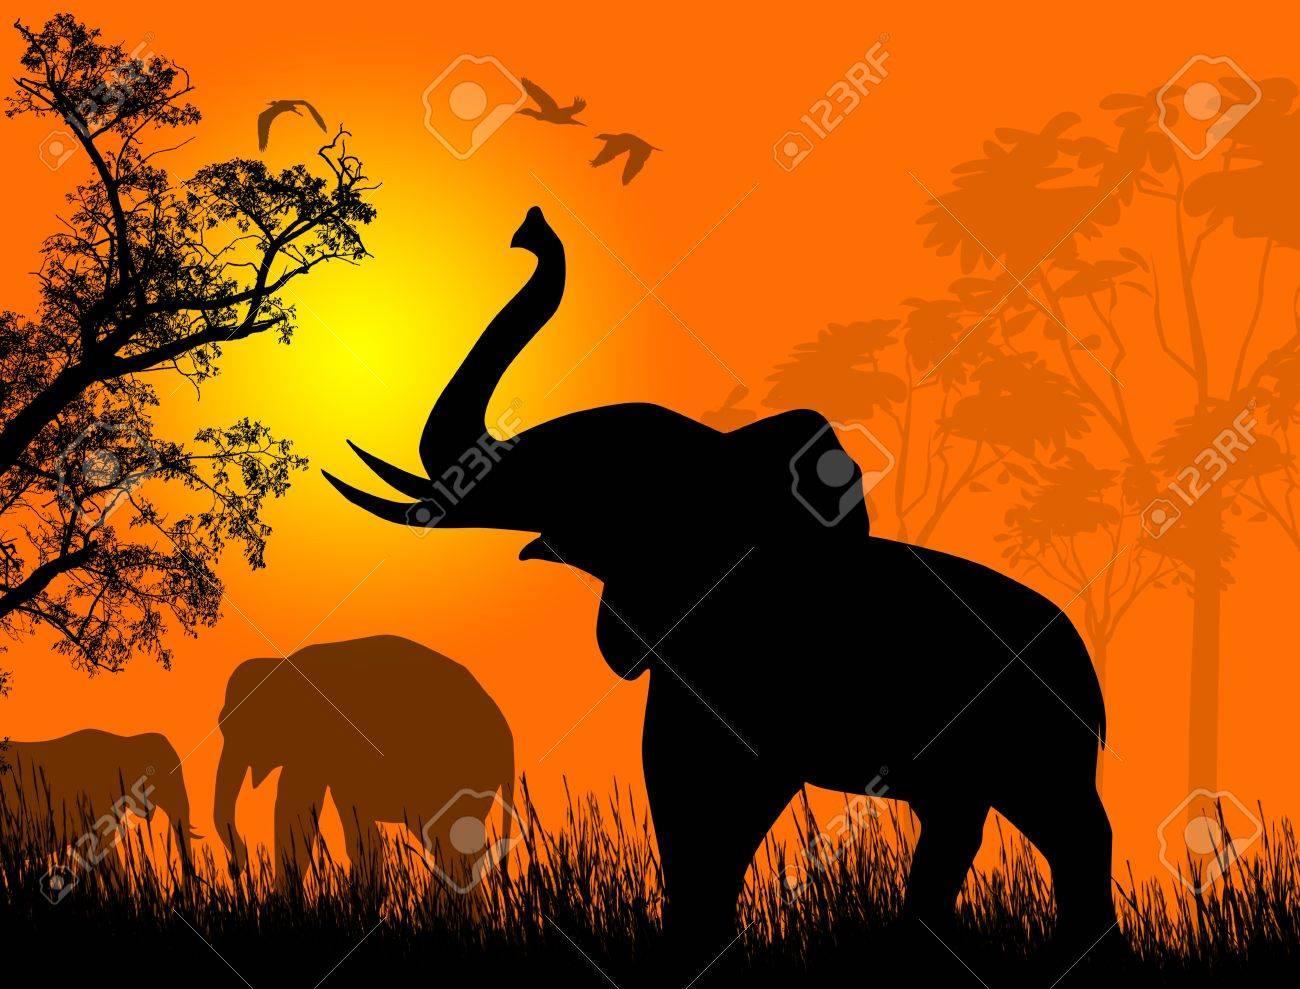 Wild elephants at sunset on beautiful landscape illustration Stock Vector - 17147833